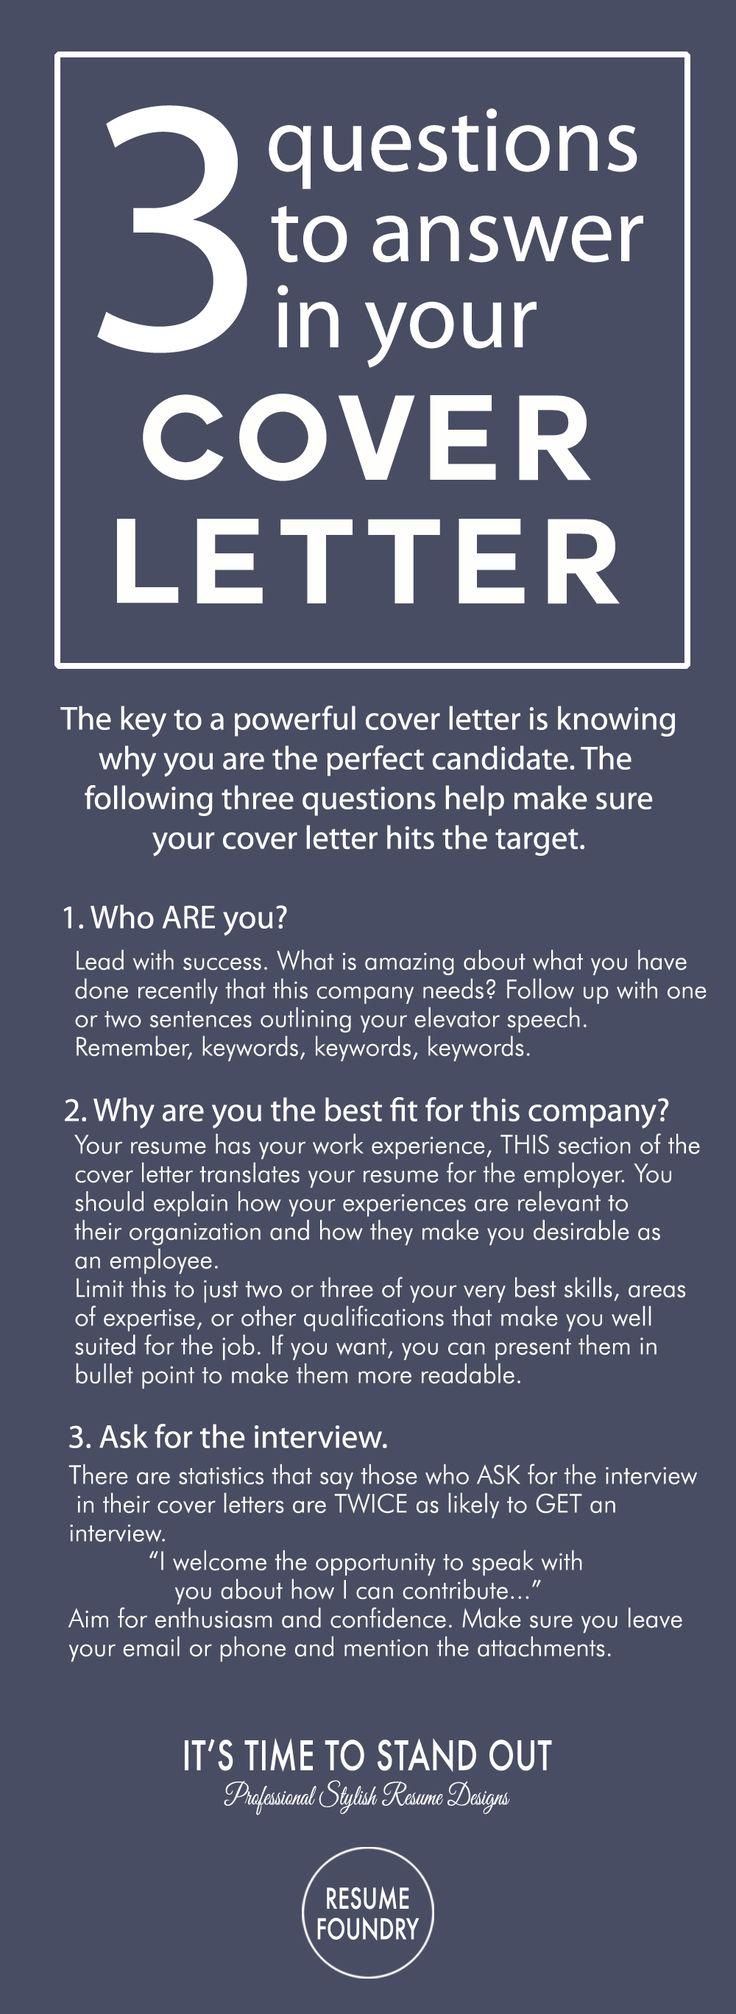 Cover Letter Outline, Cover Letter Tips